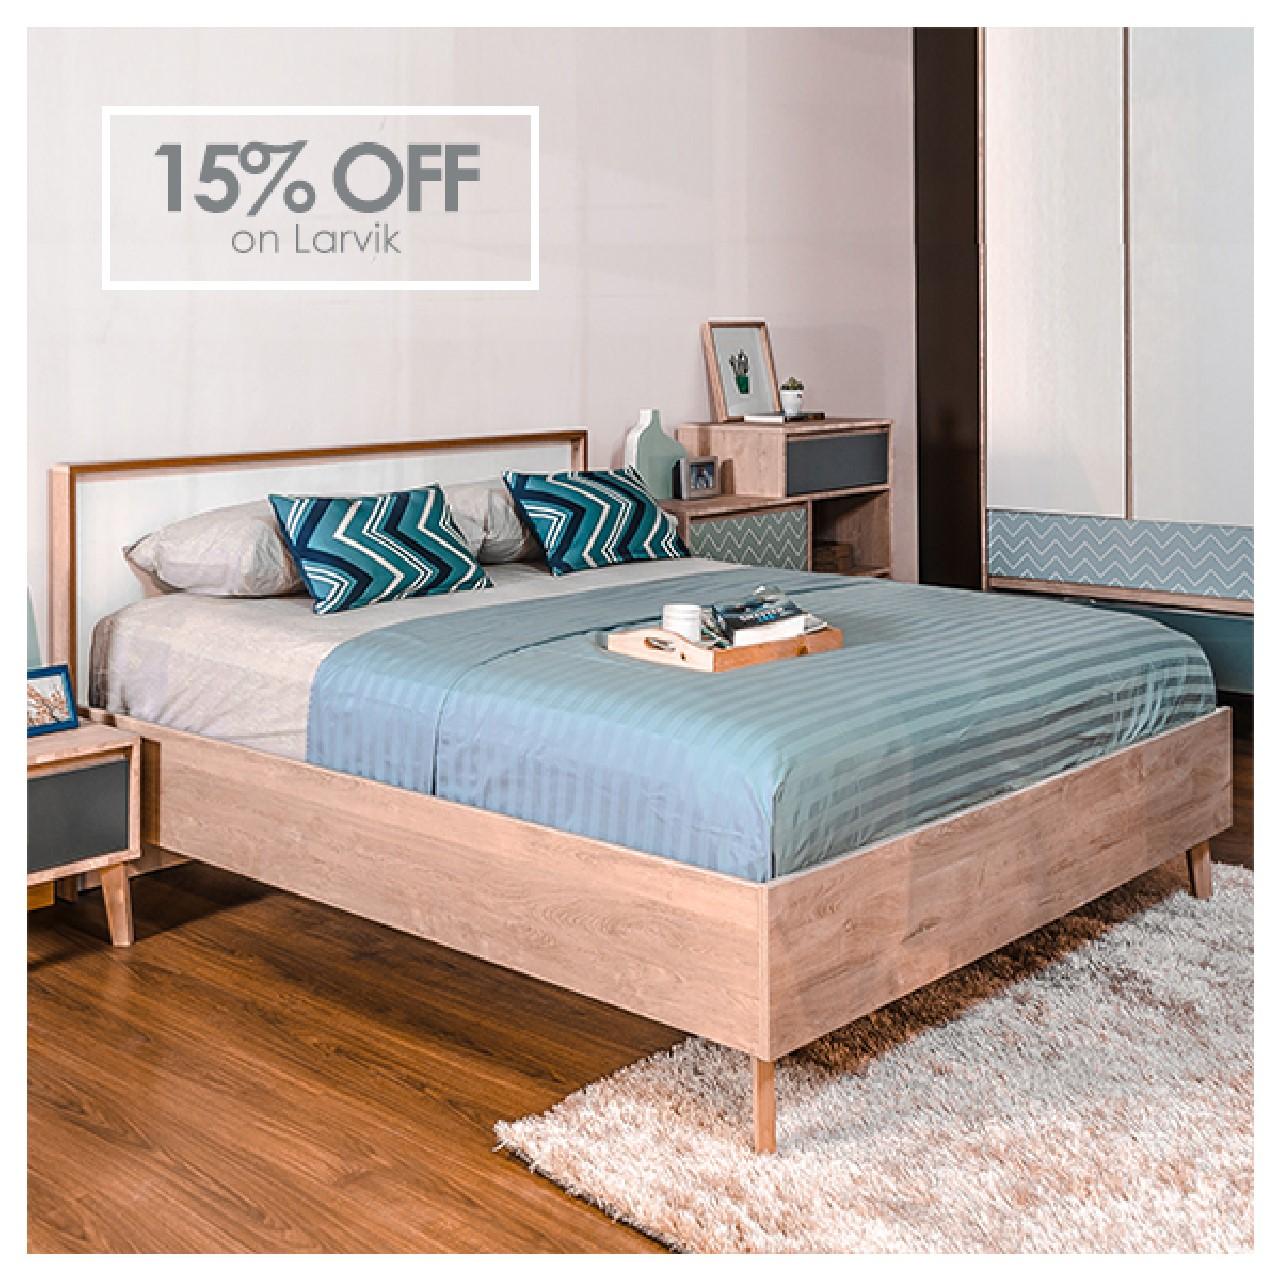 Manila Shopper Blims Bed Amp Mattress Sale May 2019